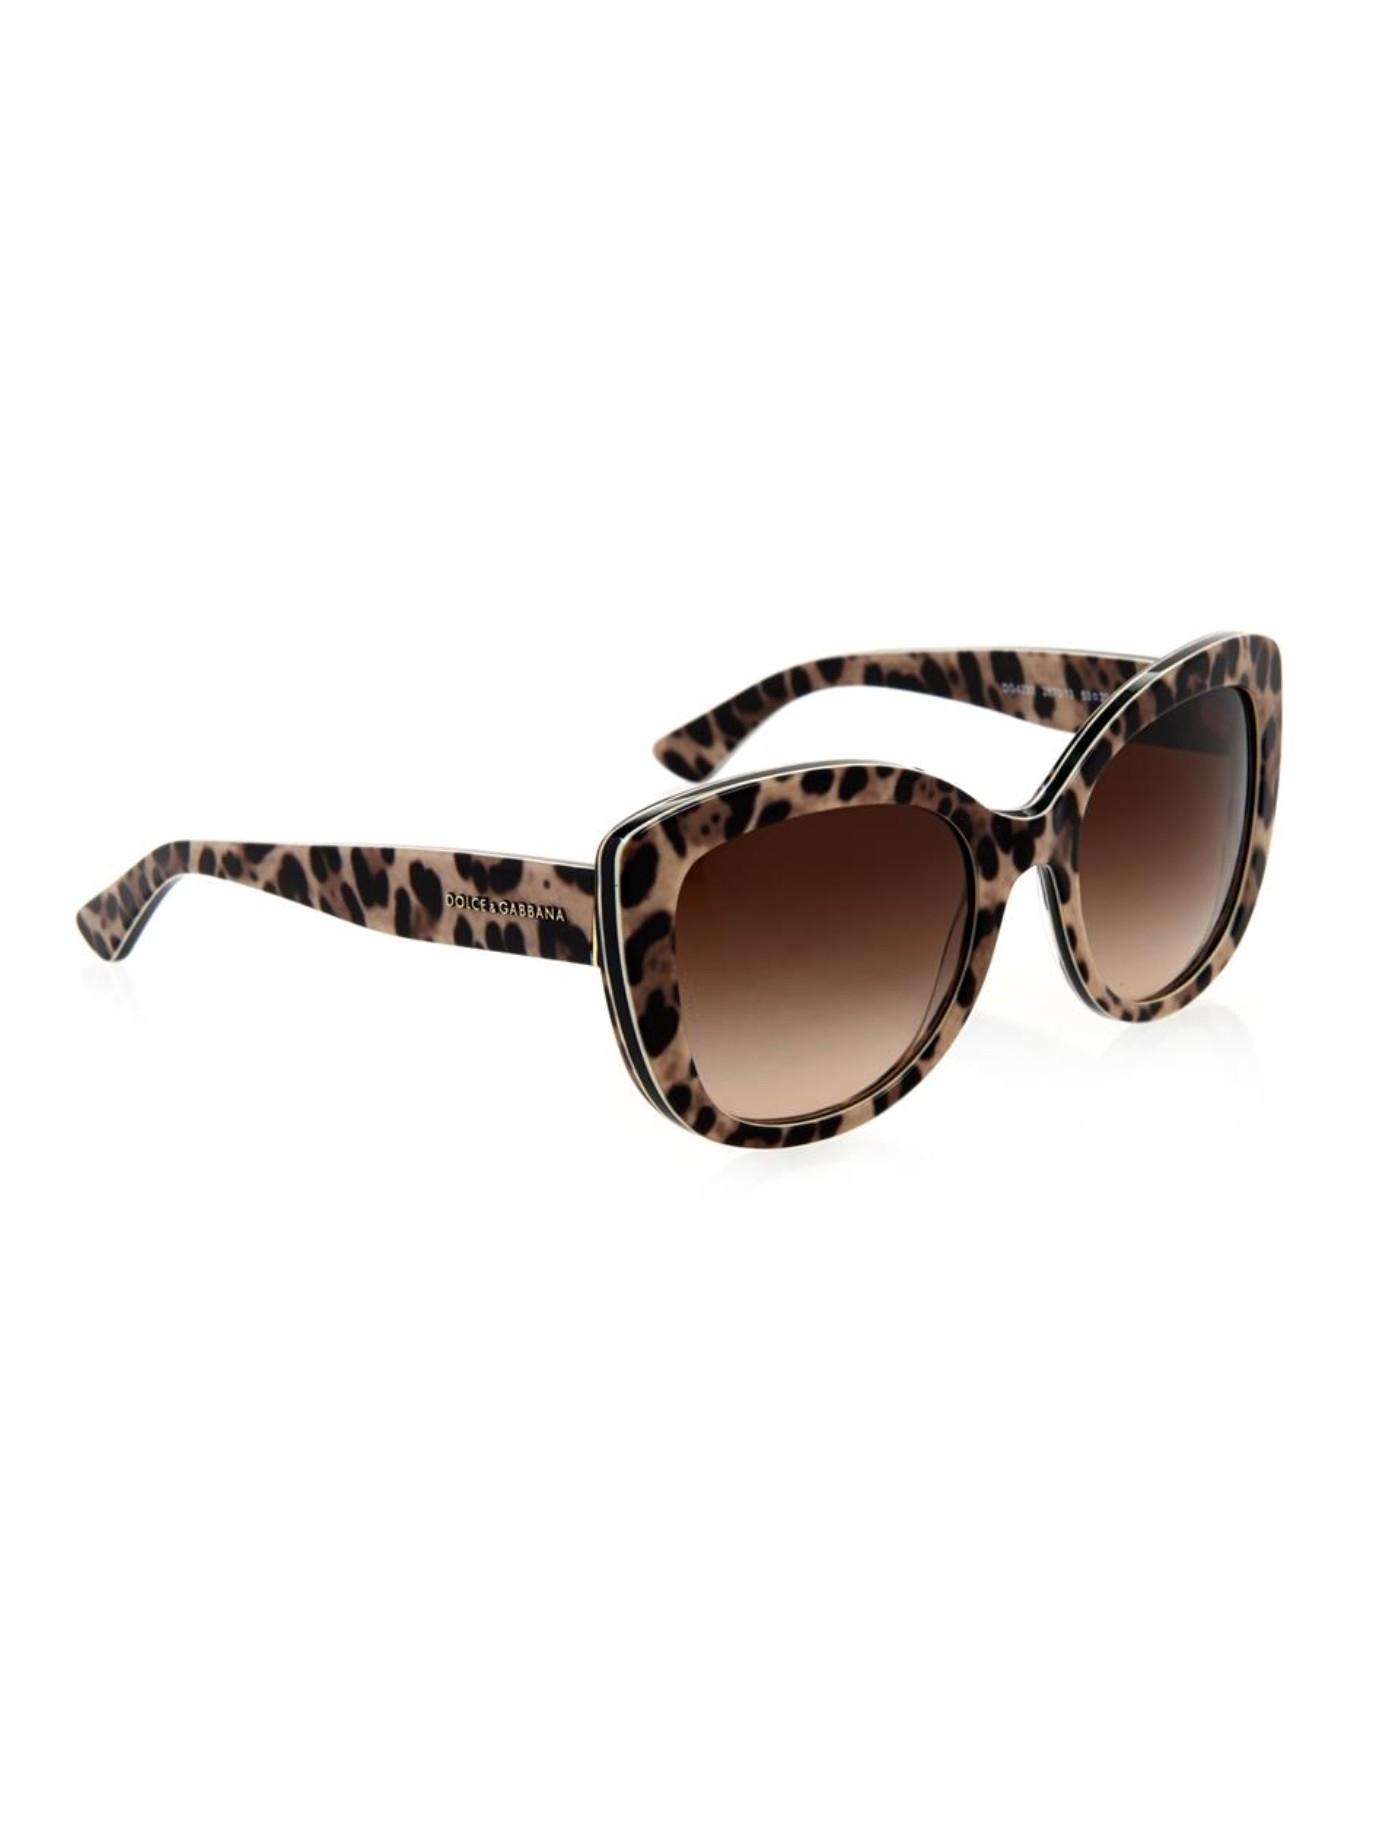 8c9807d3551 Dolce Gabbana Oversized Cat Eye Sunglasses - Bitterroot Public Library